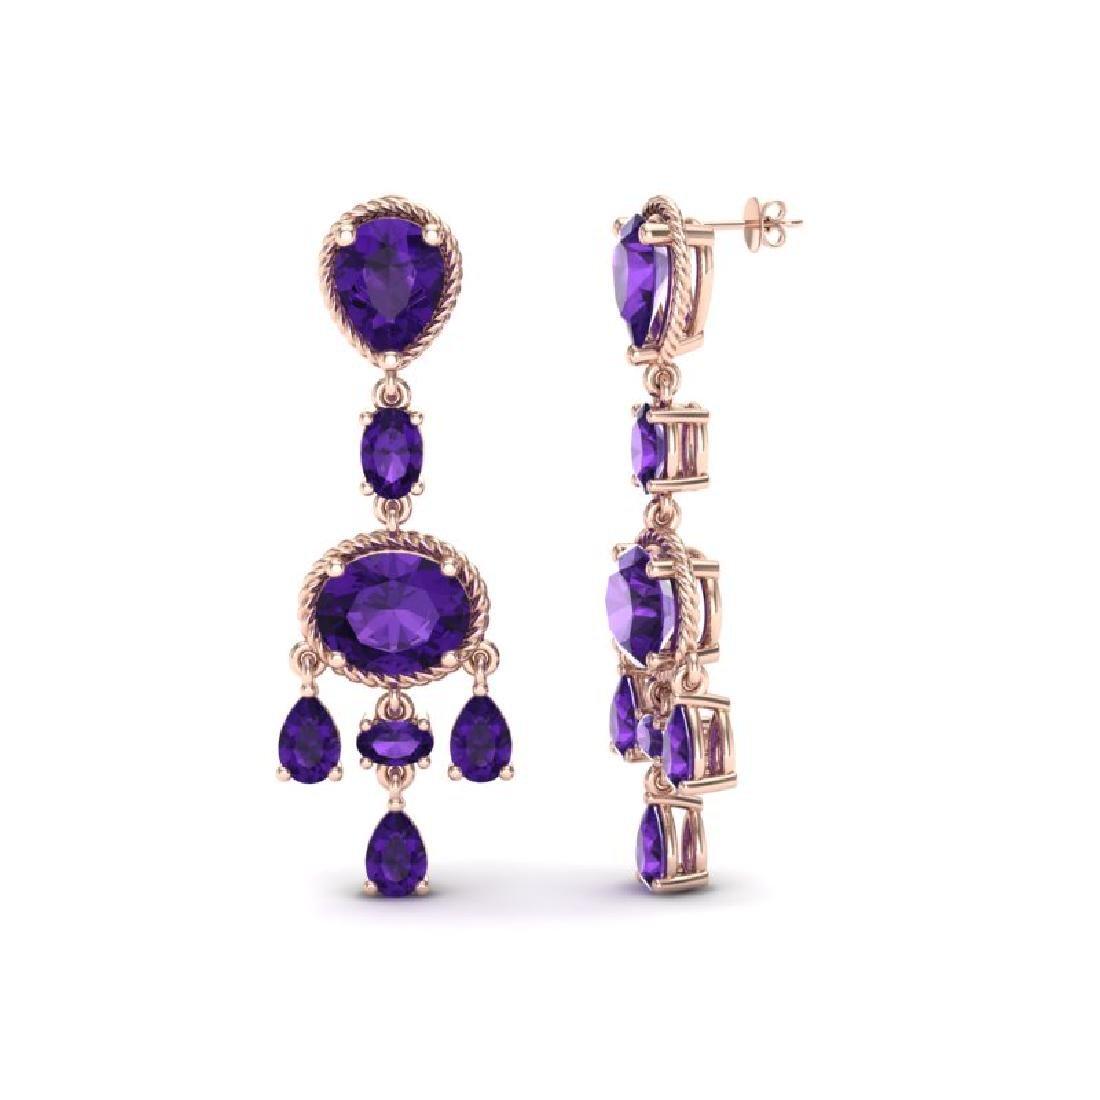 16 CTW Amethyst Earrings Designer Vintage 10K Rose Gold - 2